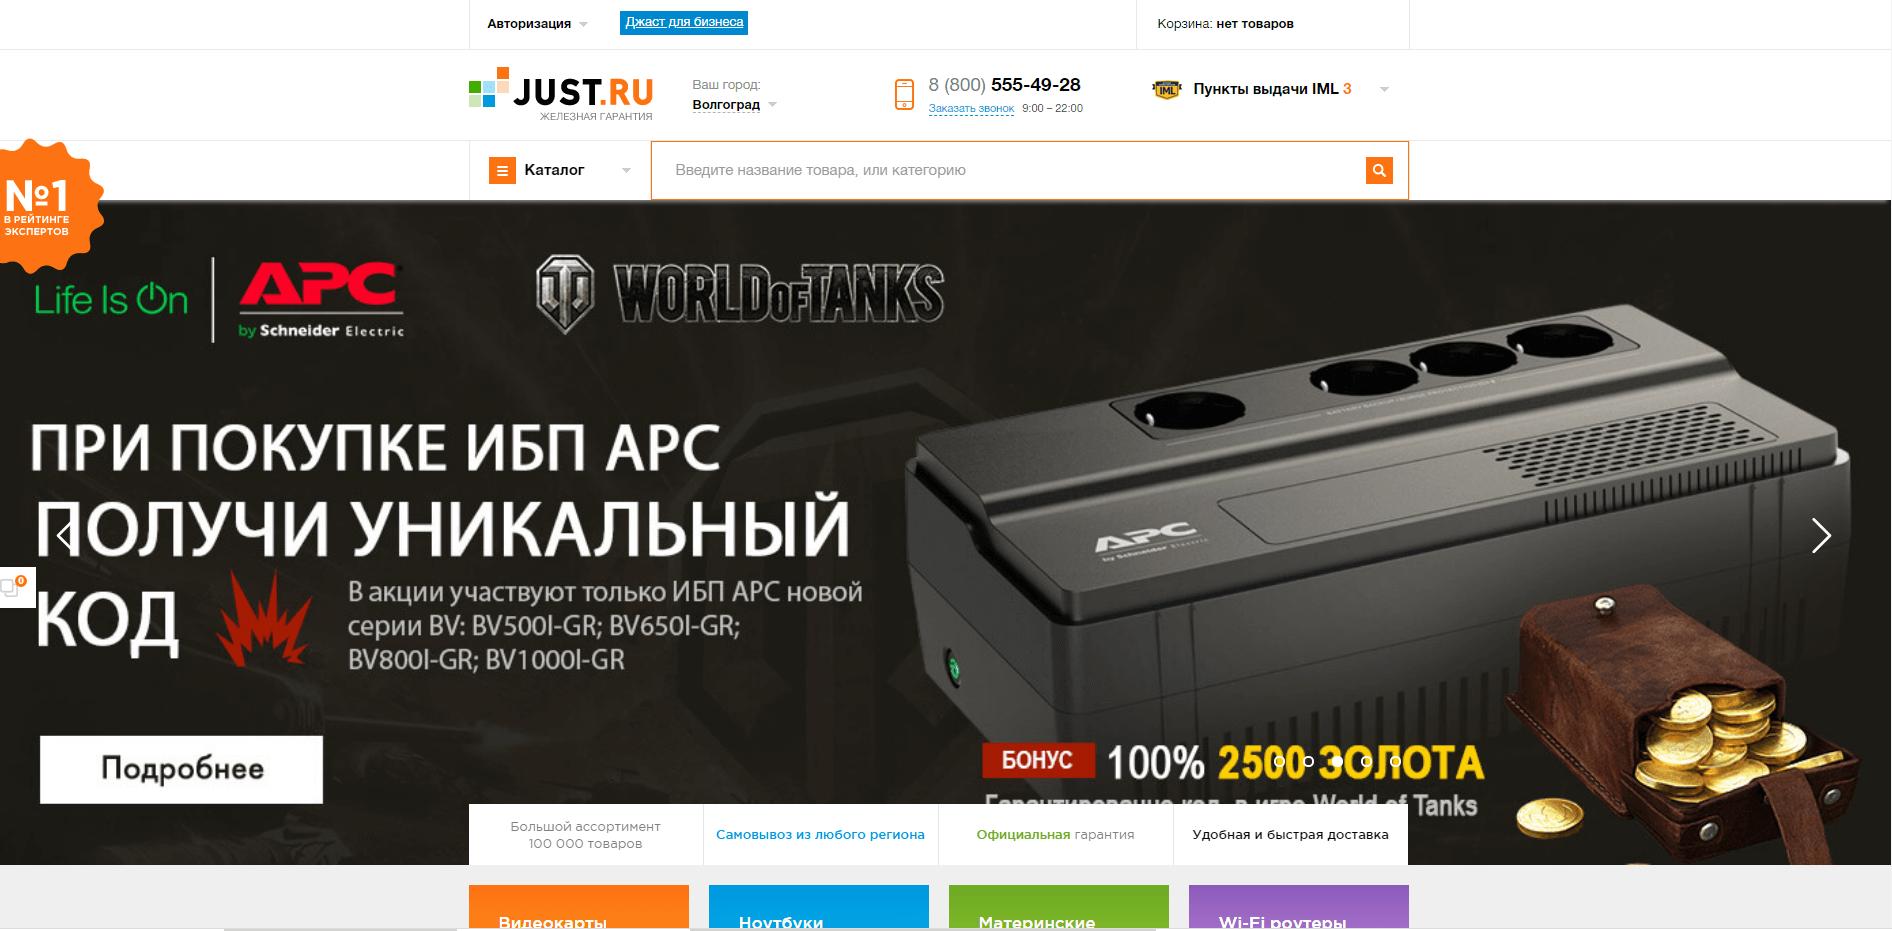 just.ru website